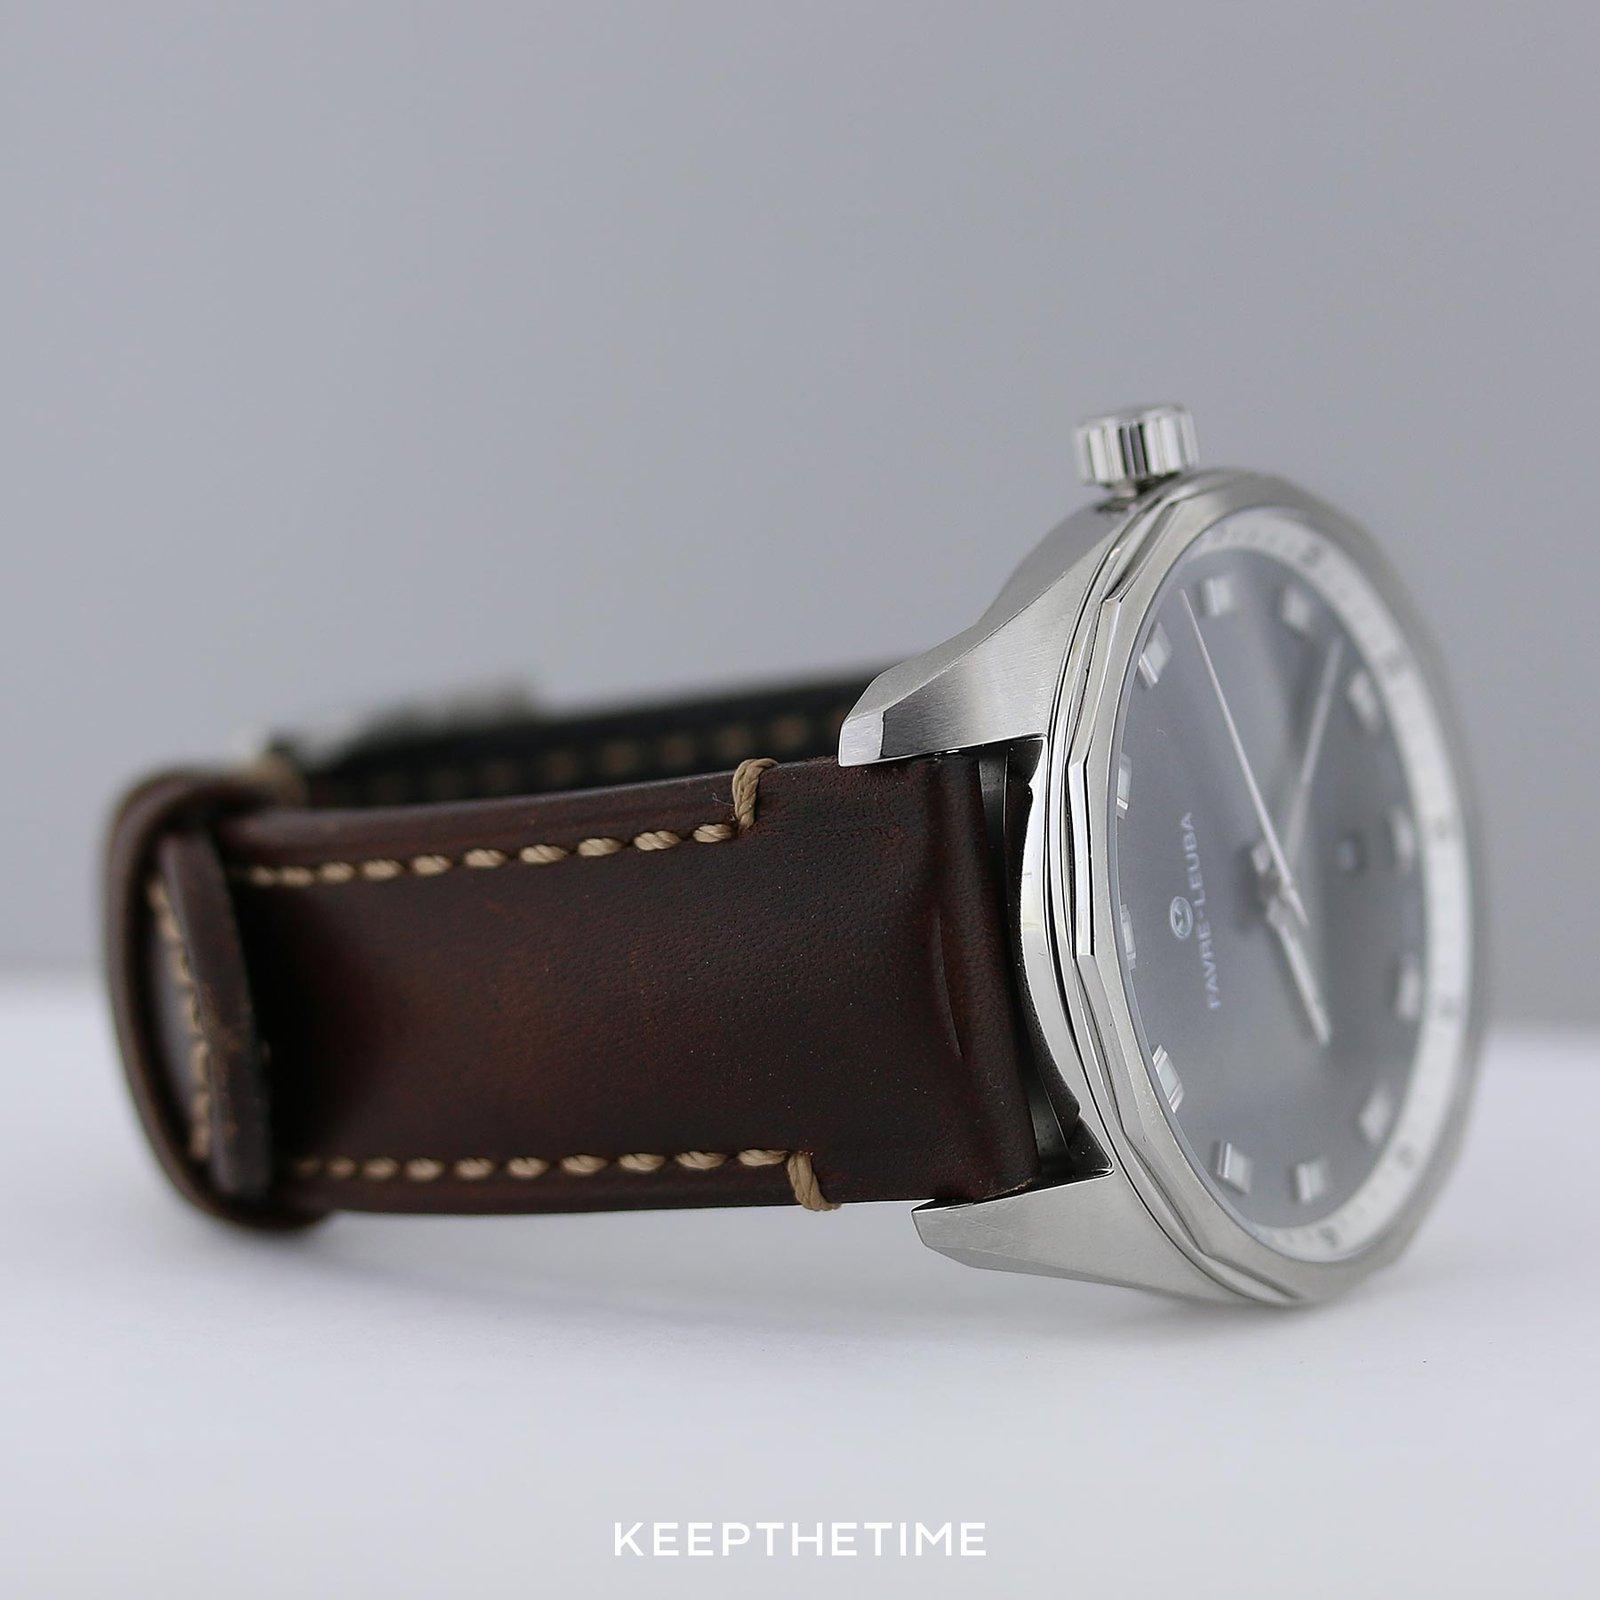 Favre-Leuba Sky Chief Date 43mm Automatic Watch